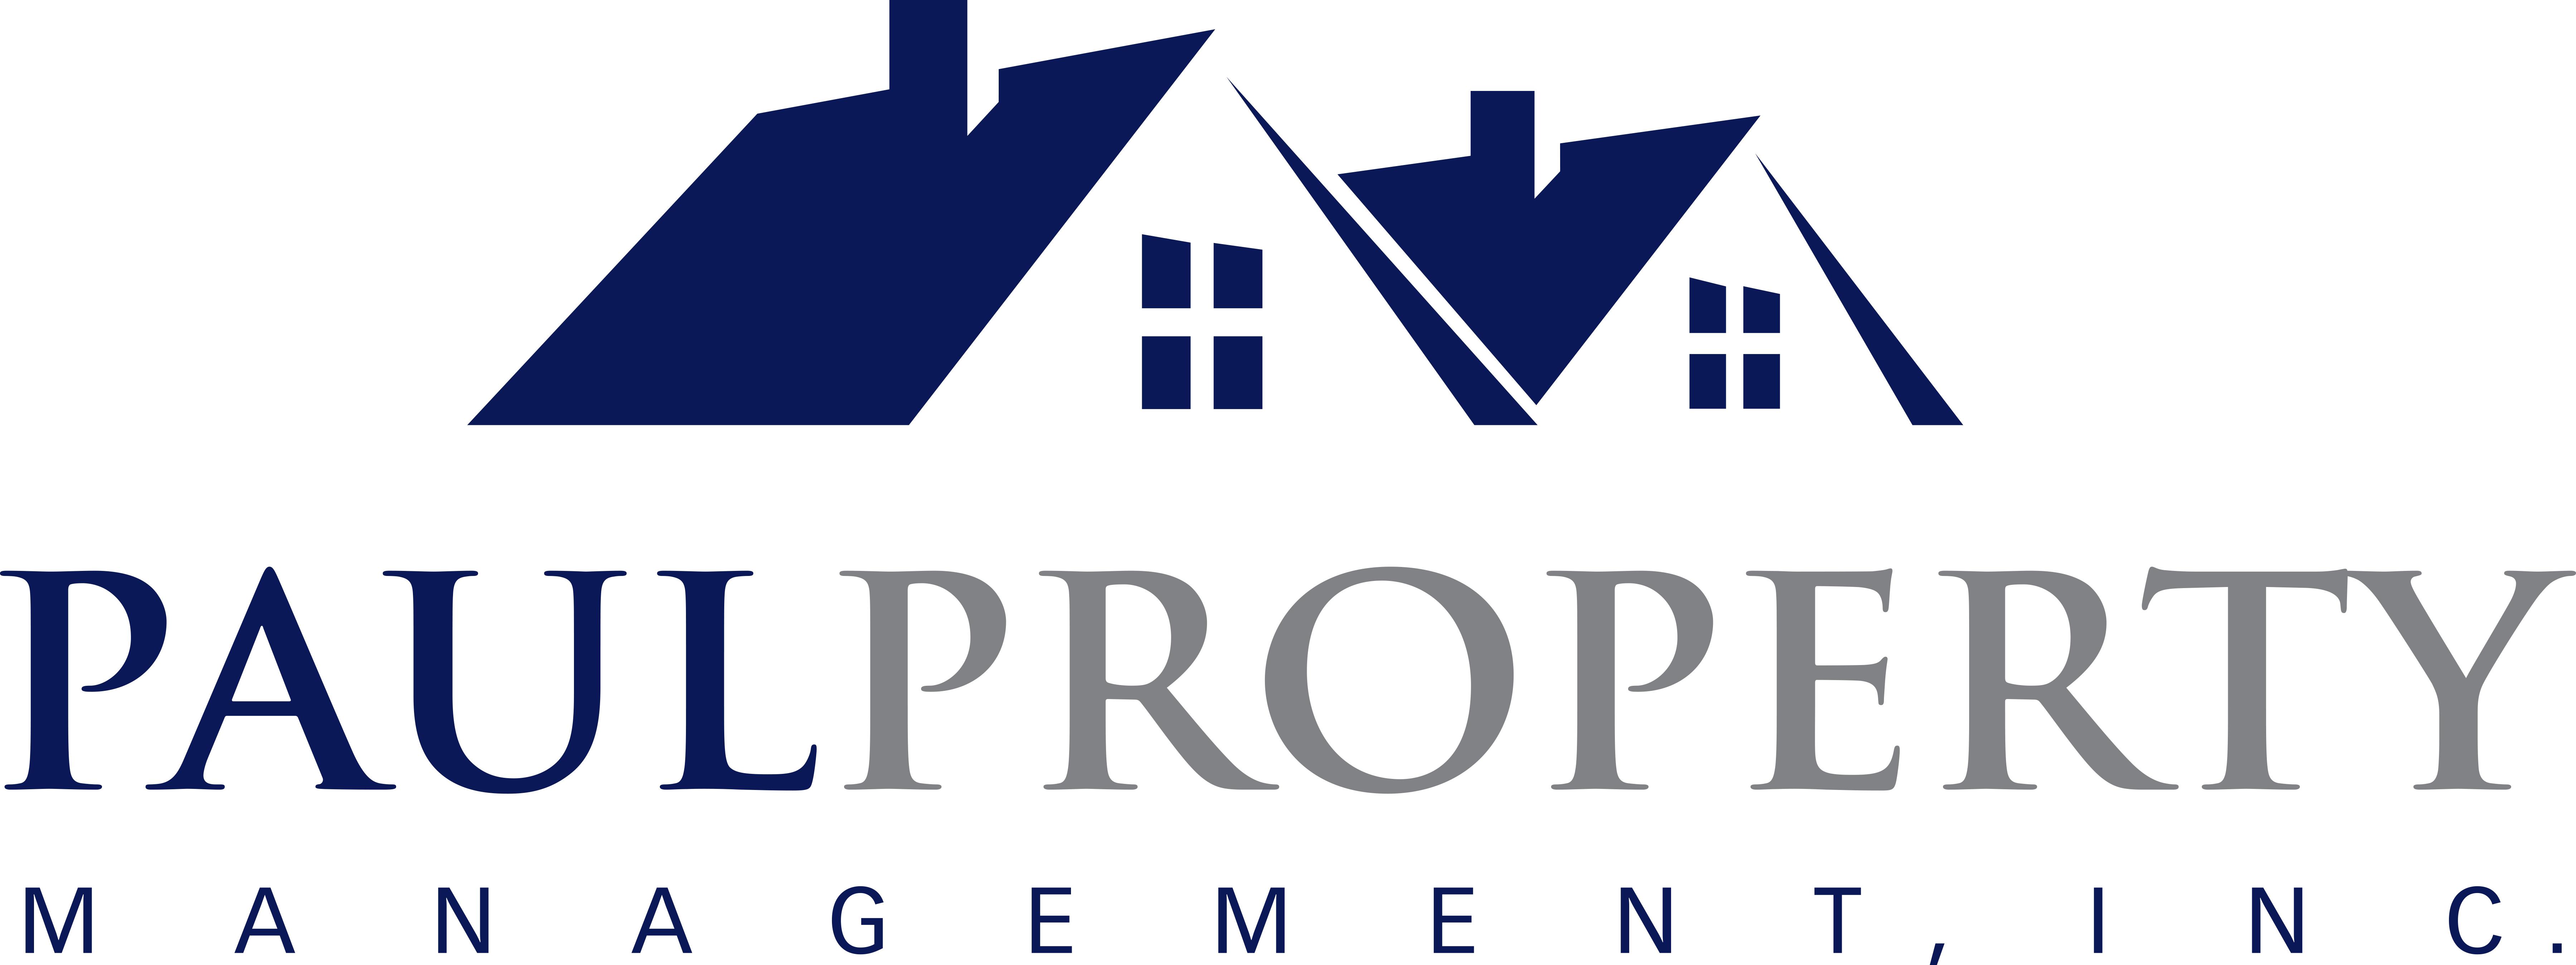 Paul Property Management Wichita Ks